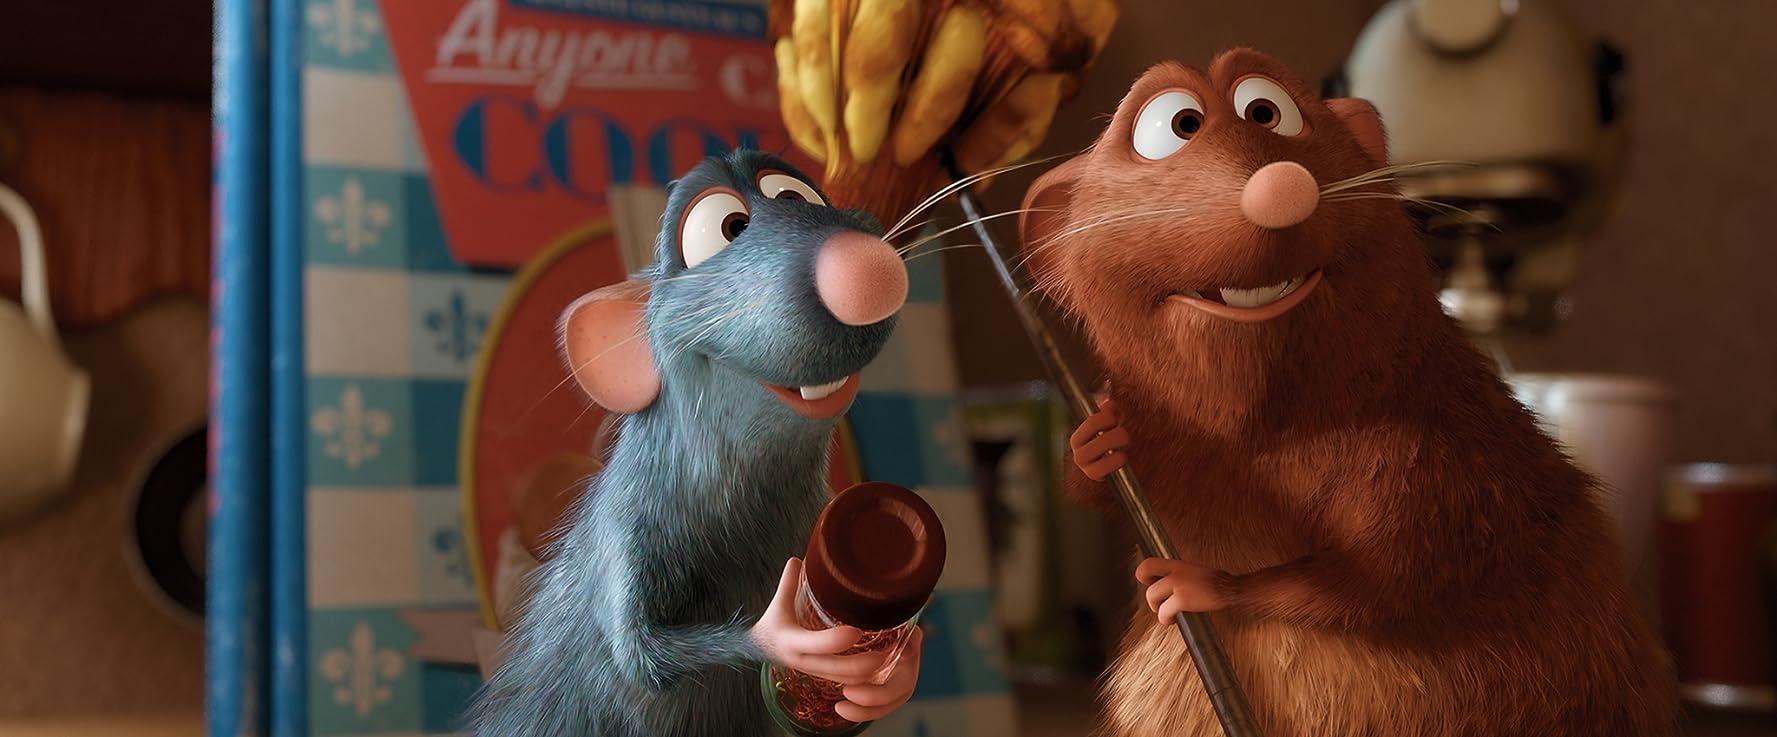 Patton Oswalt and Peter Sohn in Ratatouille (2007)